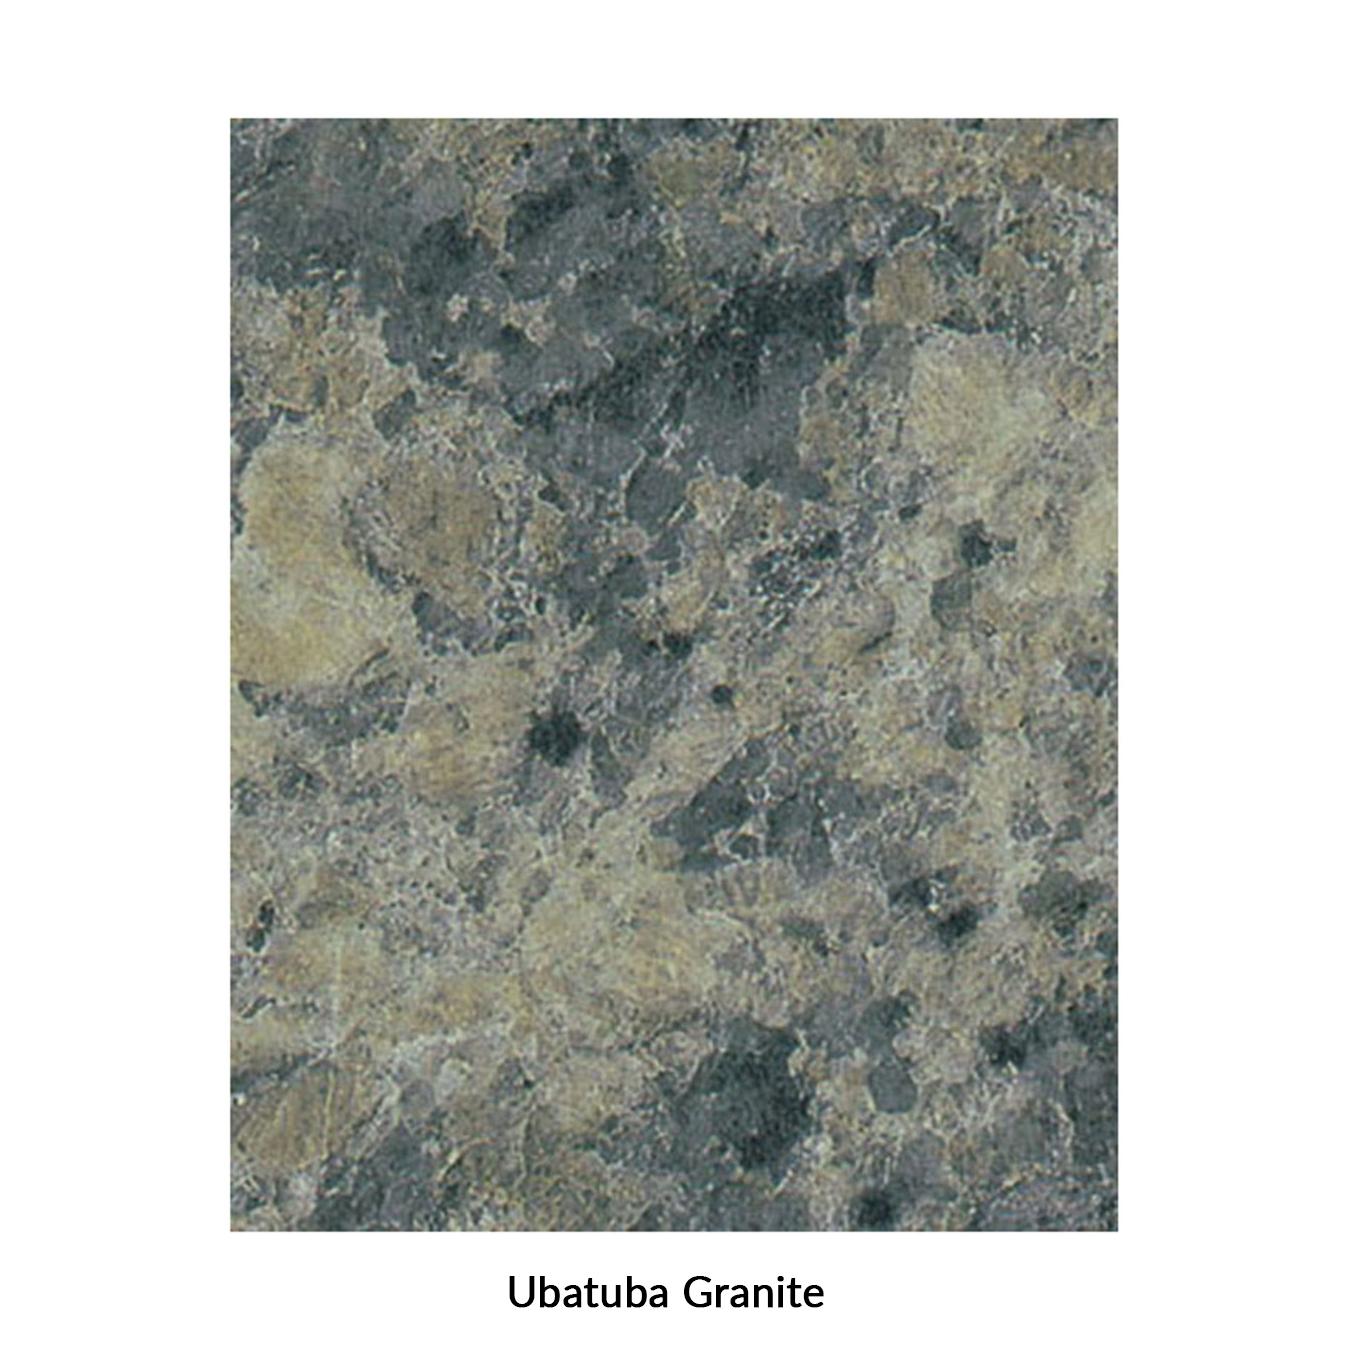 16-ubatuba-granite.jpg